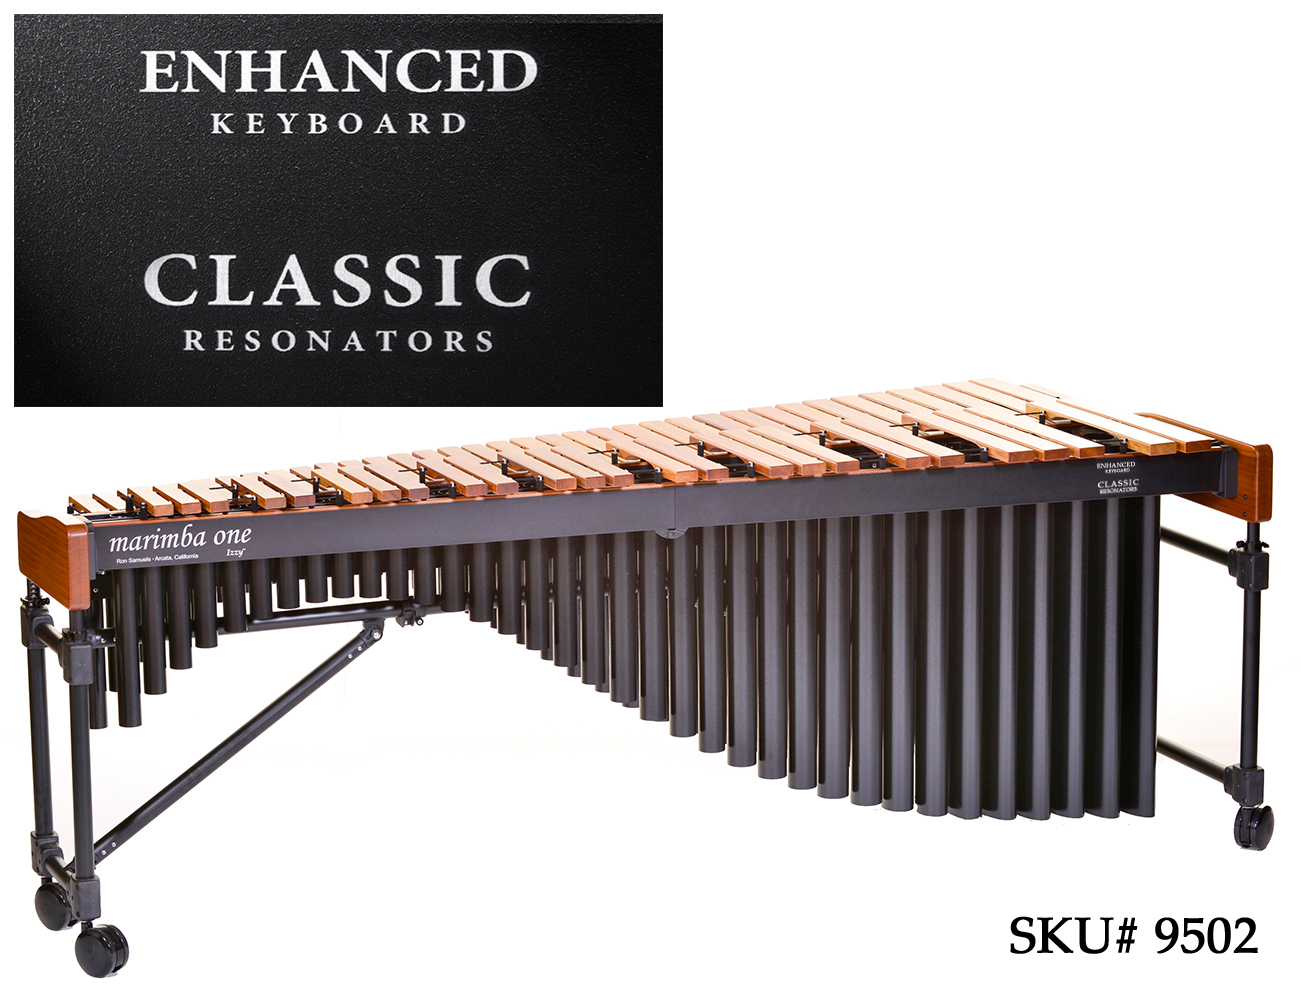 marimba one(マリンバワン)マリンバ IZZYシリーズEnhanced&Classic(5オクターブ) #9502 / 専用ケース付き【海外お取り寄せ商品】